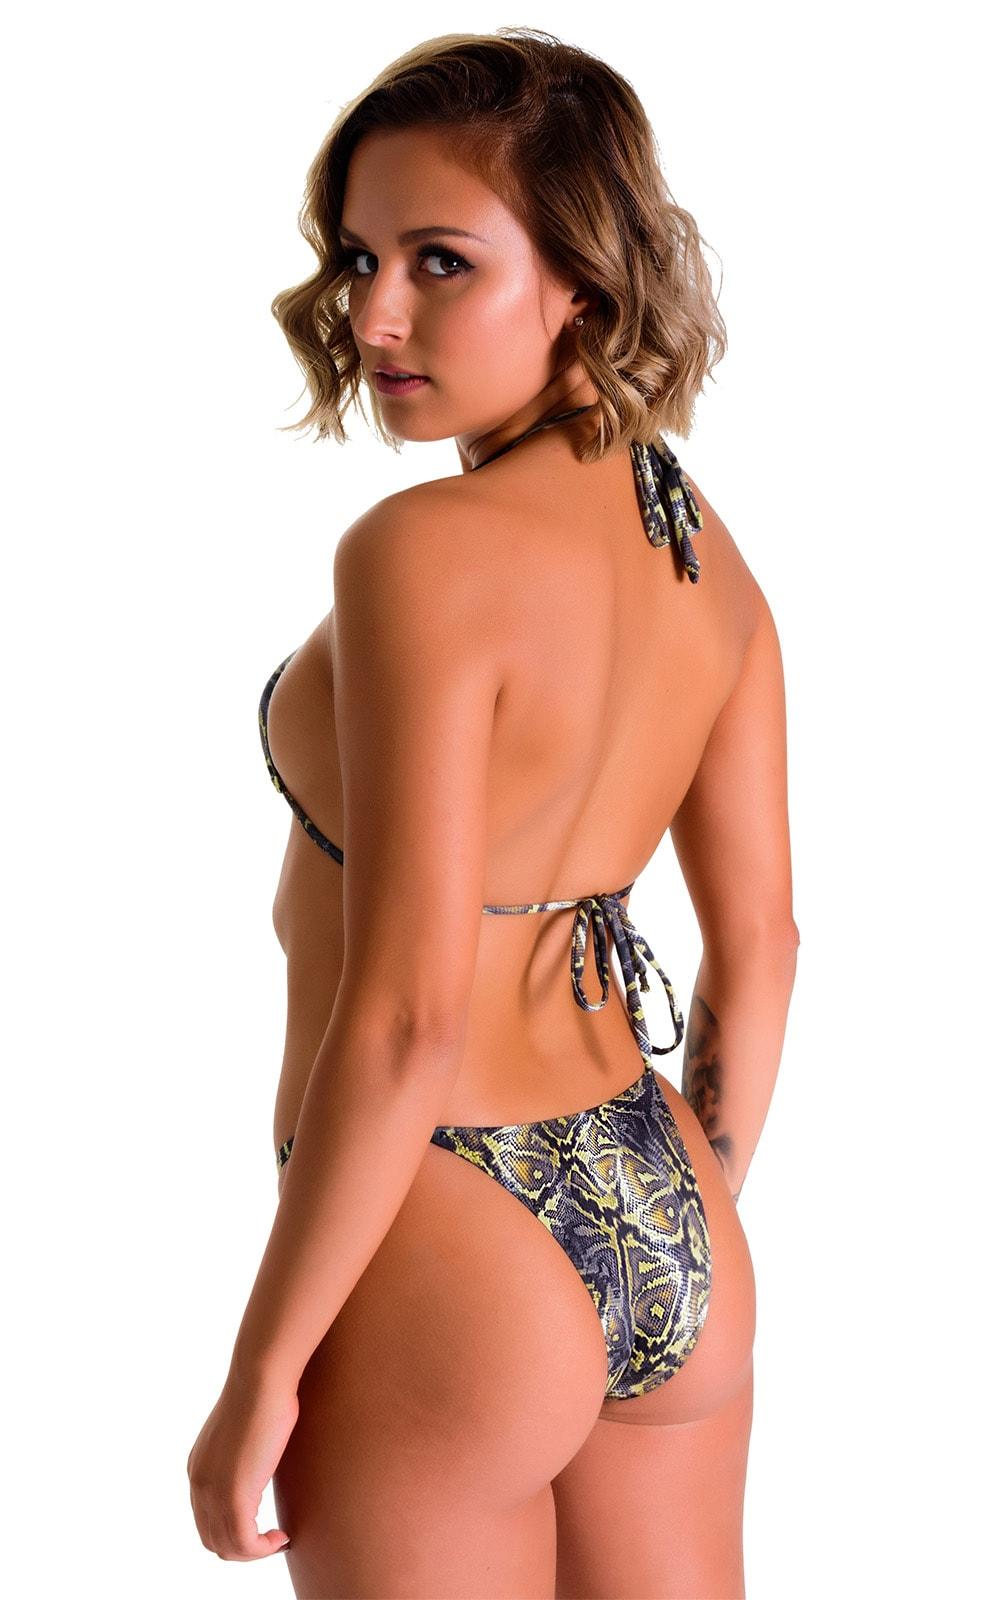 Skinny Side Rio Bikini Bottom in Super ThinSkinz Coiled Python 2